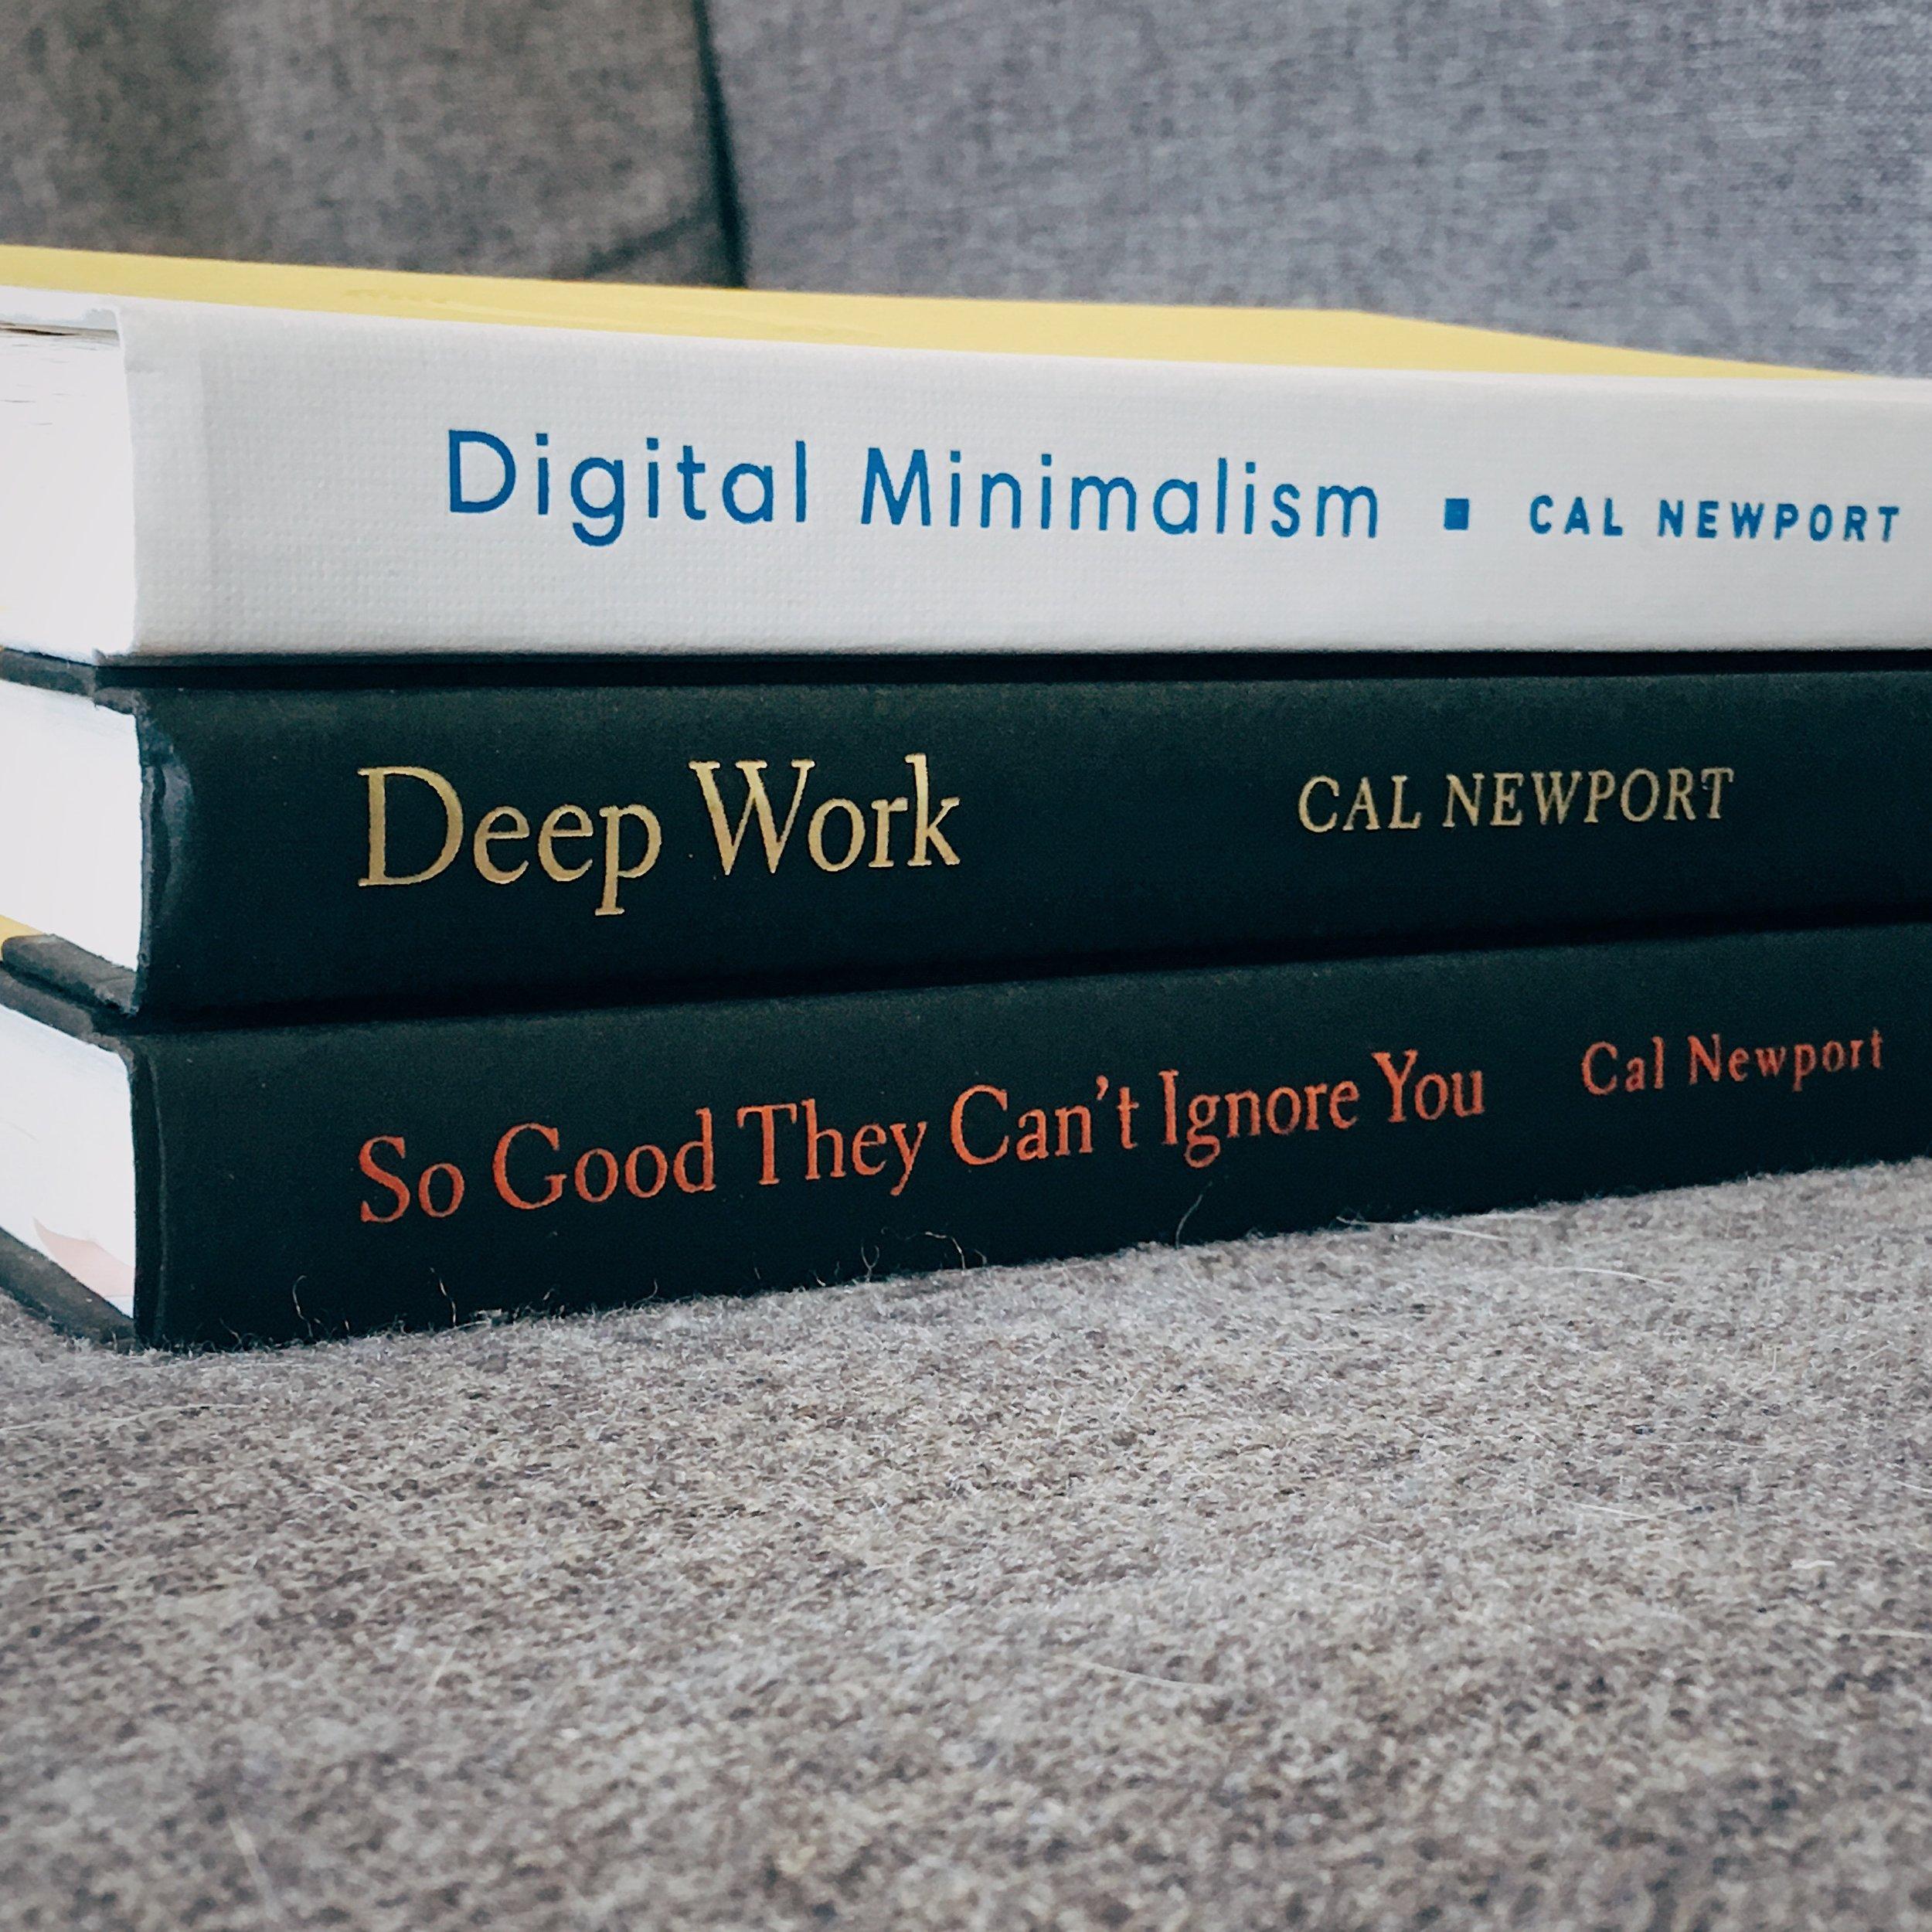 digital-minimalism-cal-newport-spines.jpg